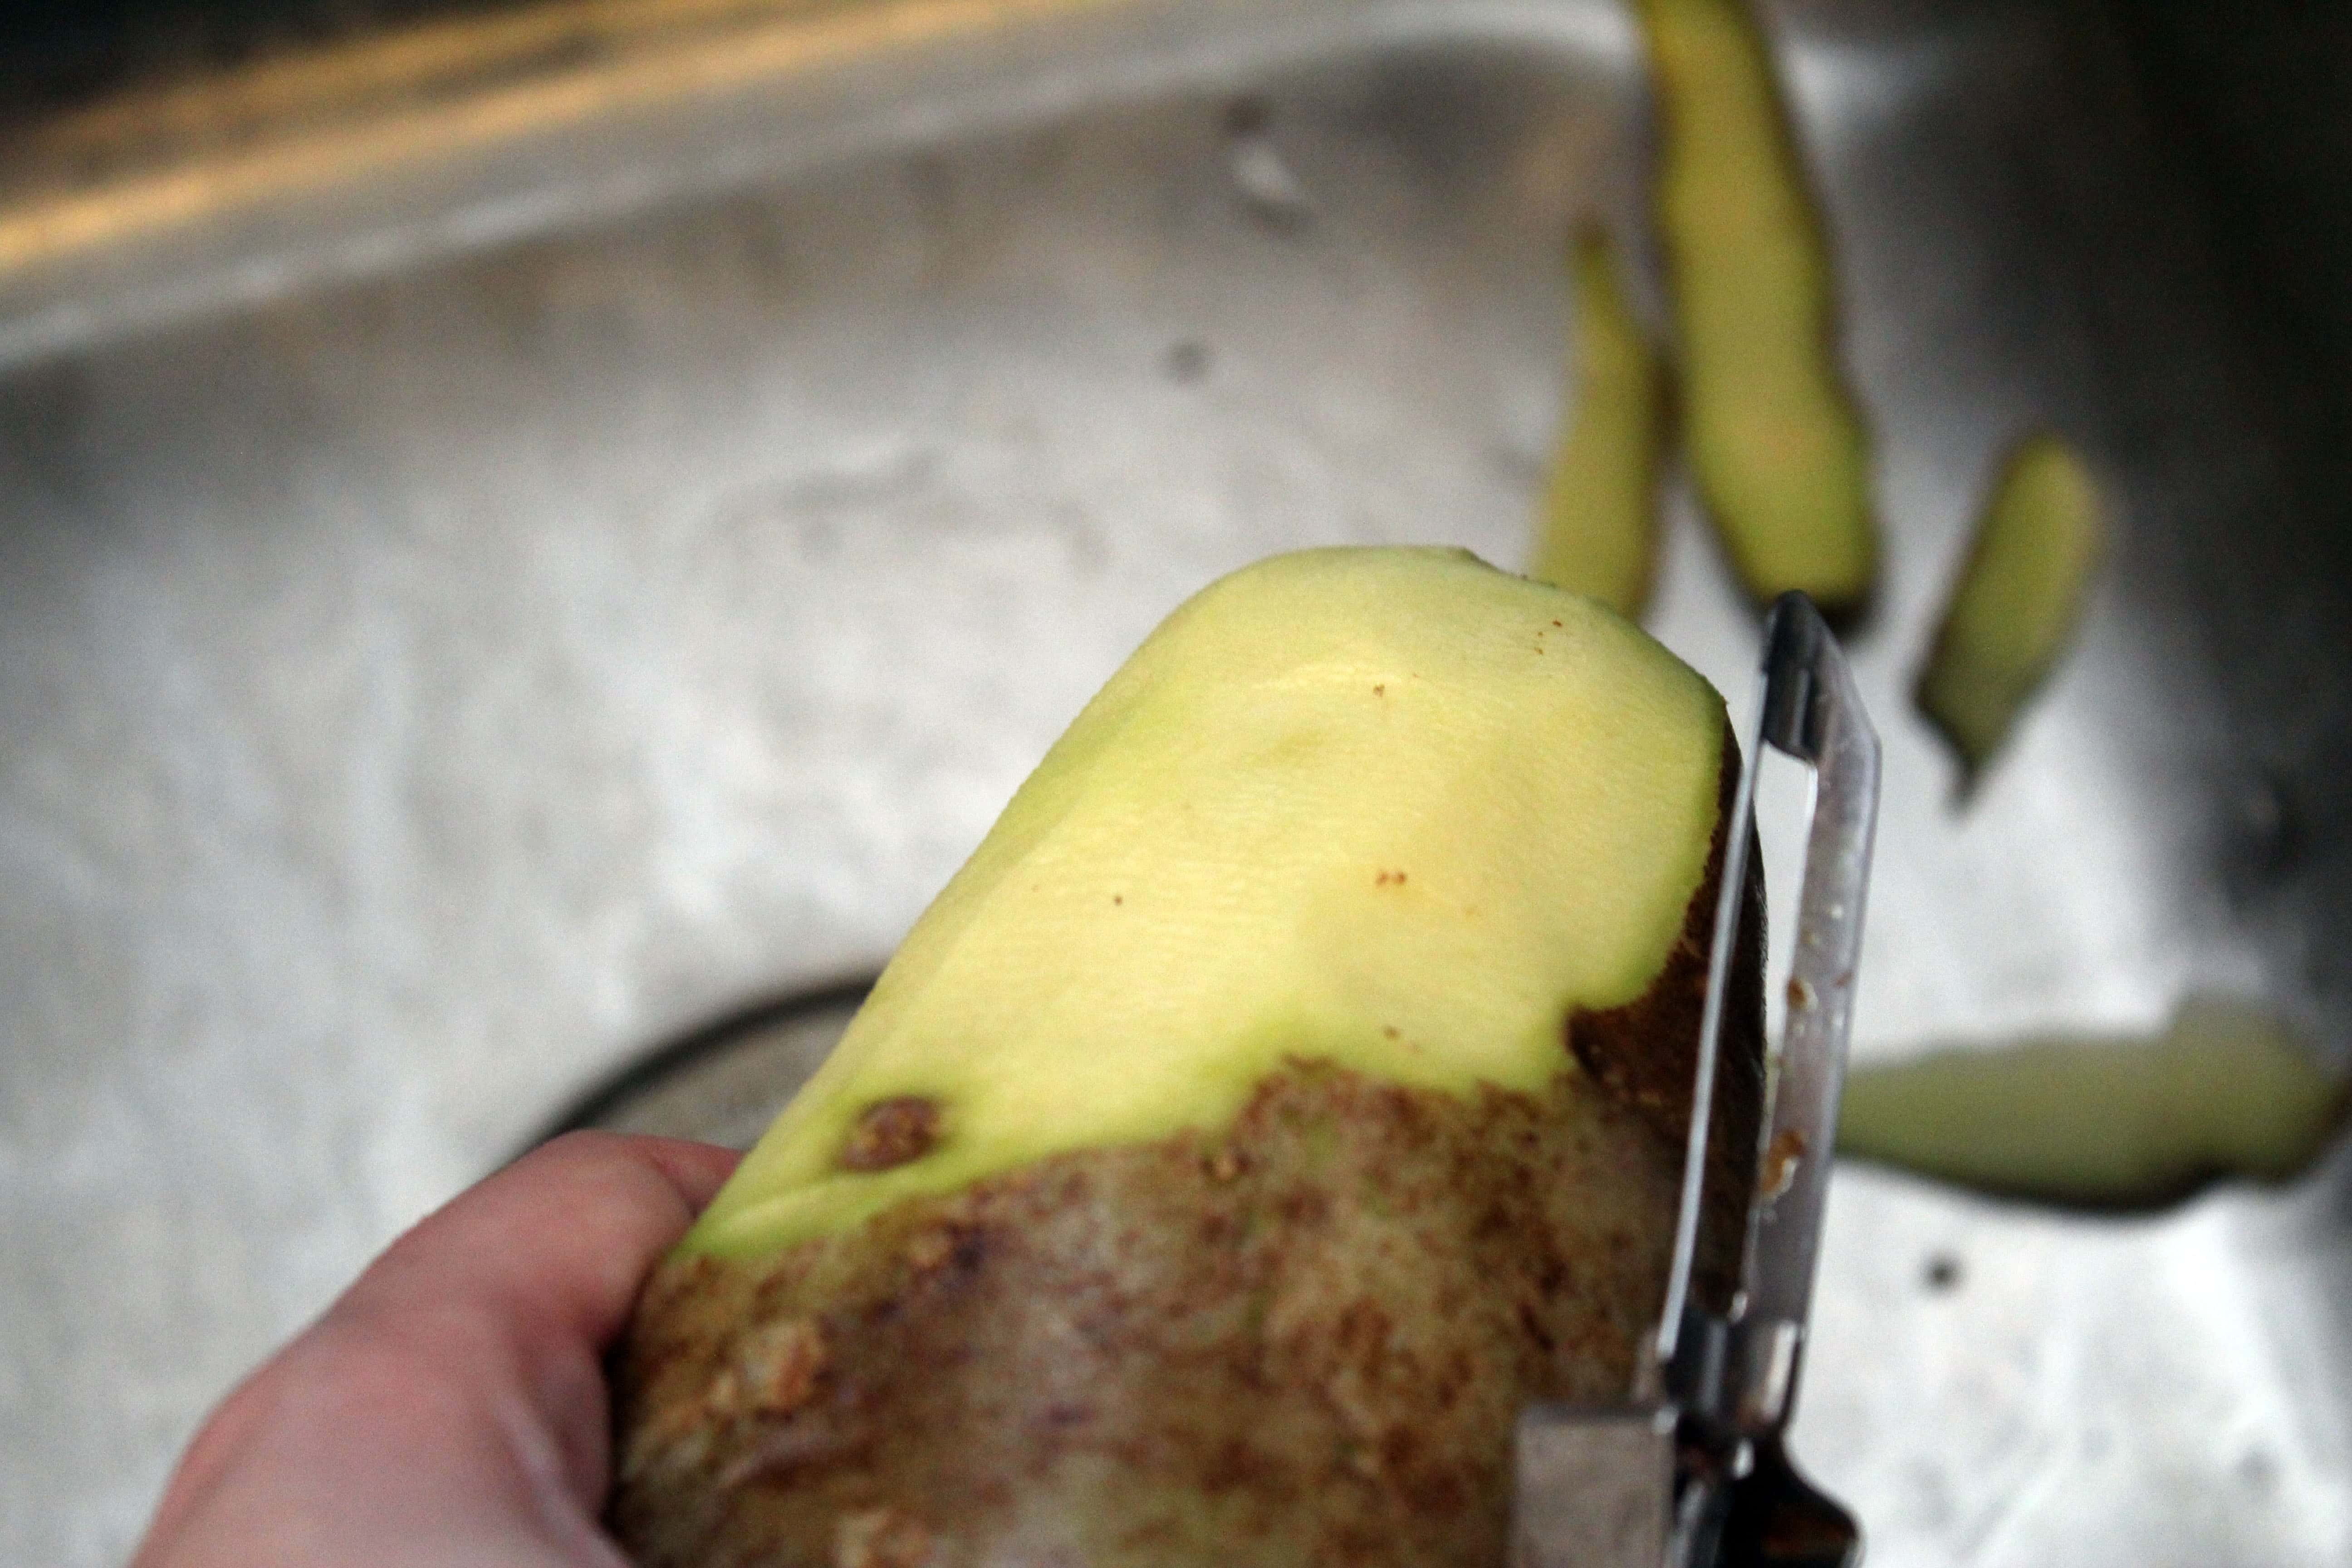 Peel and wash potatoes